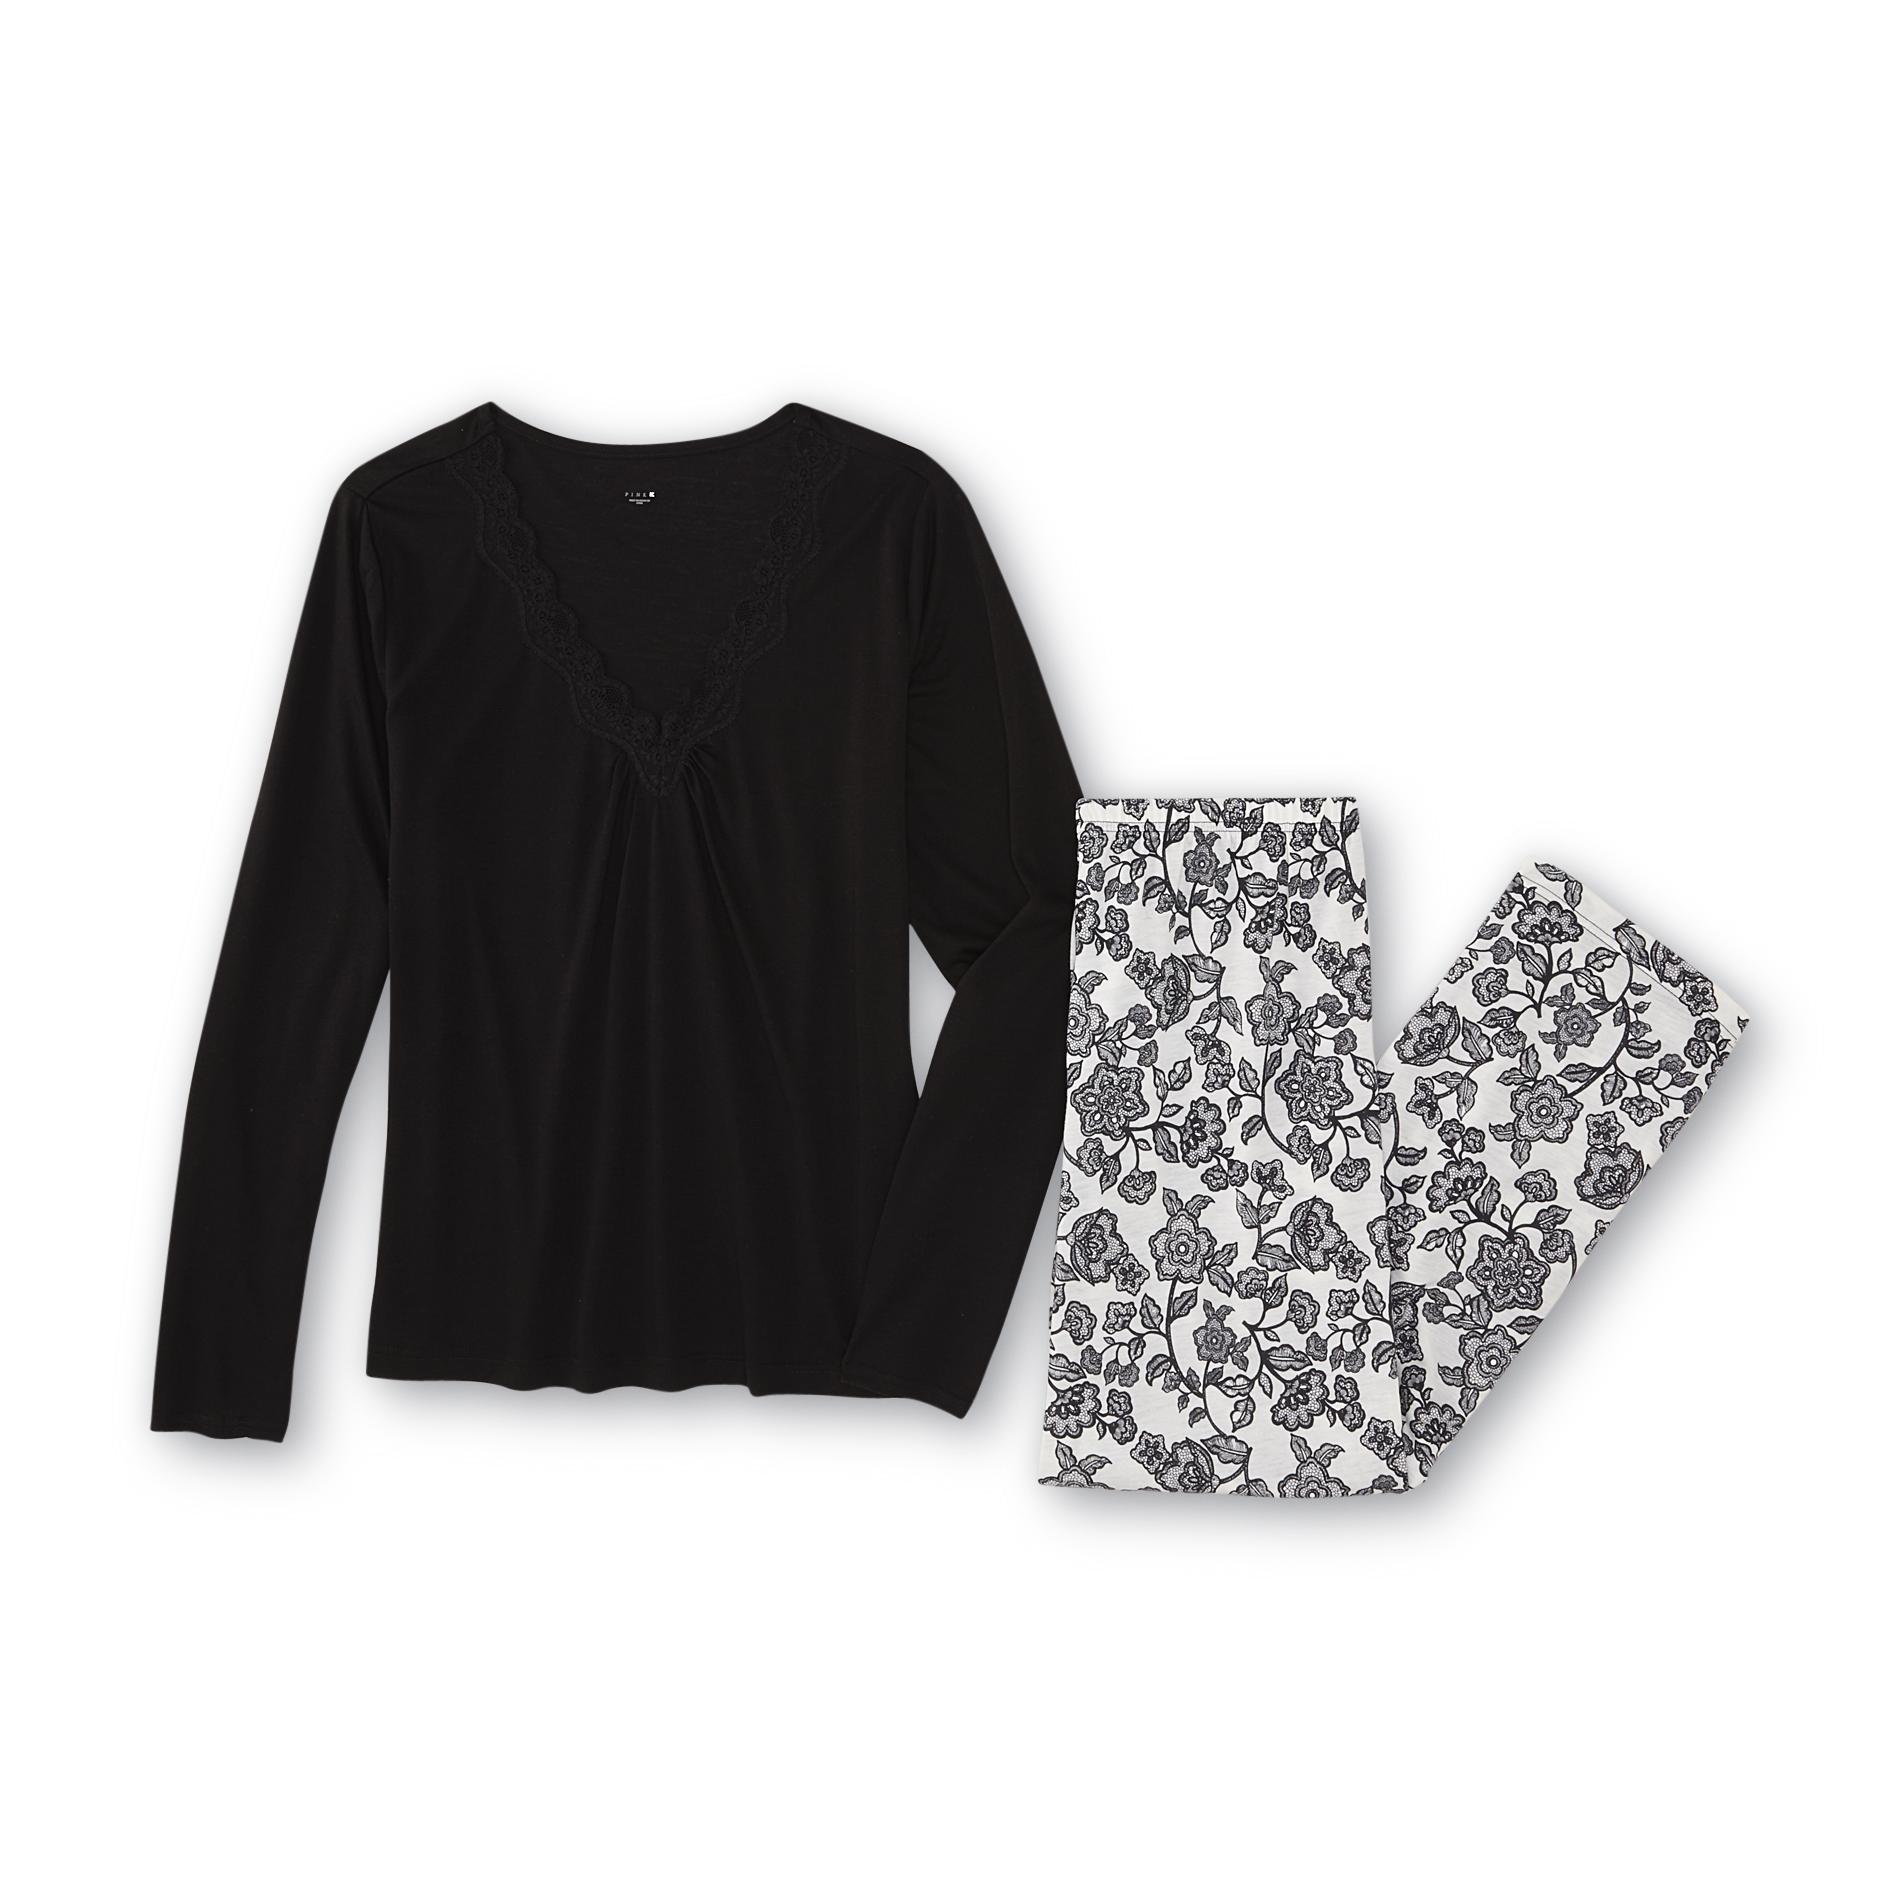 Pink K Women's Pajama Top & Pants - Floral Print